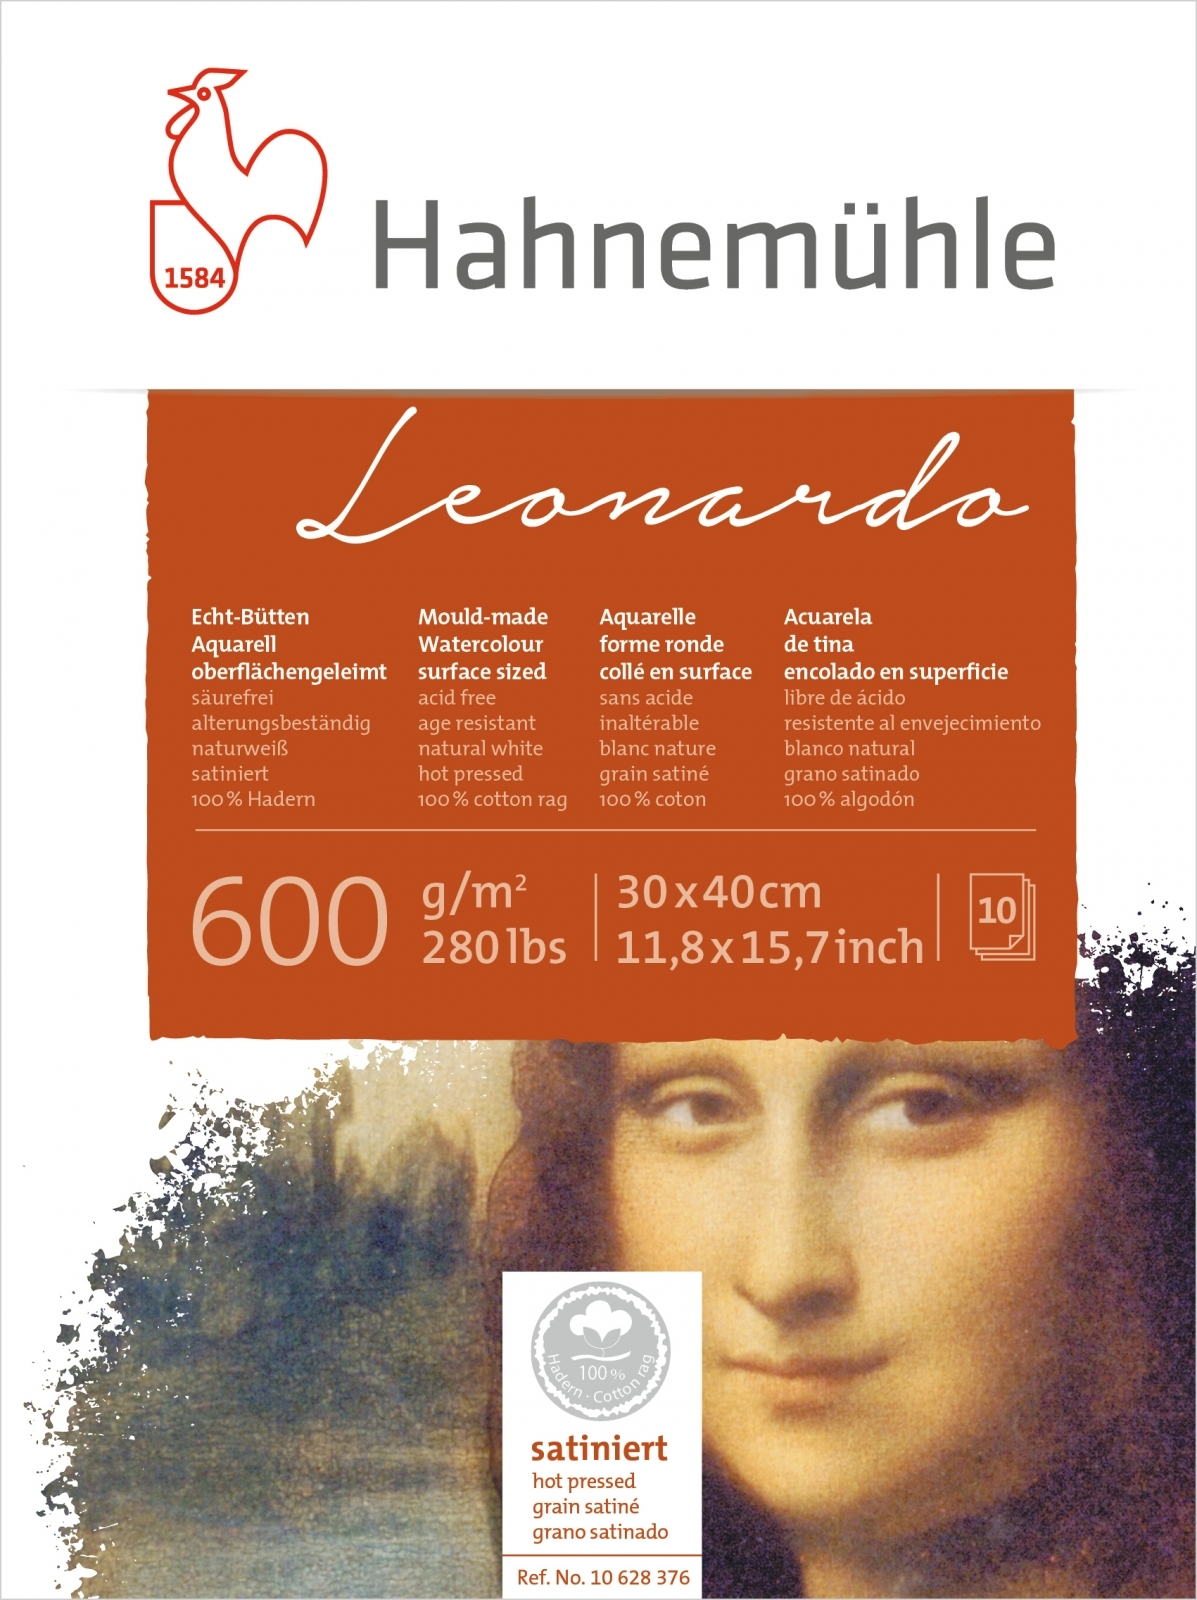 Papel Hahnemuhle Leonardo Textura Satinada 600g/m2 30x40 10f - Papelaria Botafogo